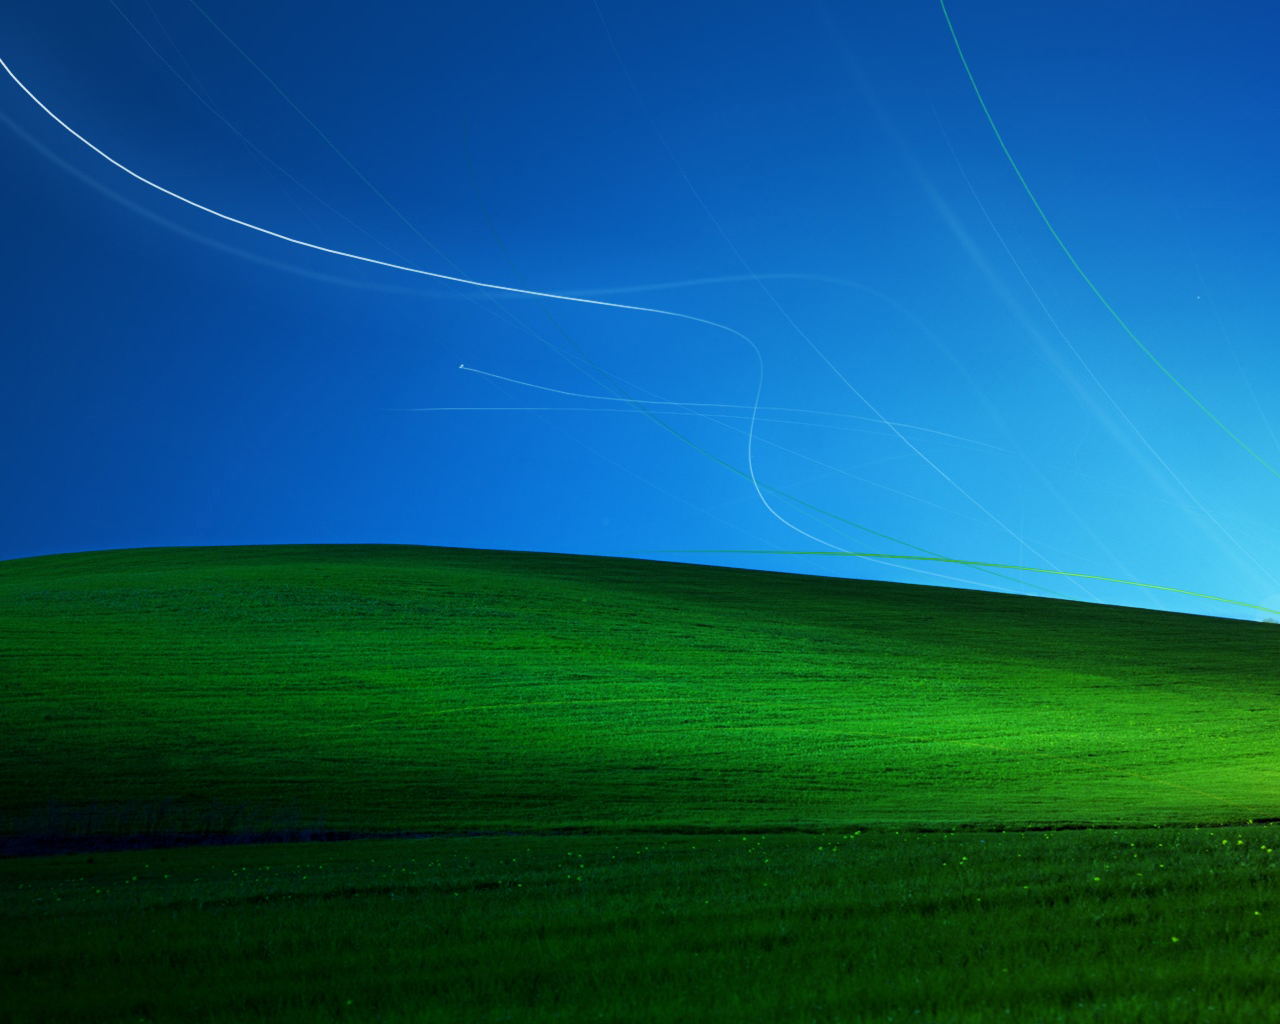 64+ Windows Xp Wallpaper Bliss on WallpaperSafari